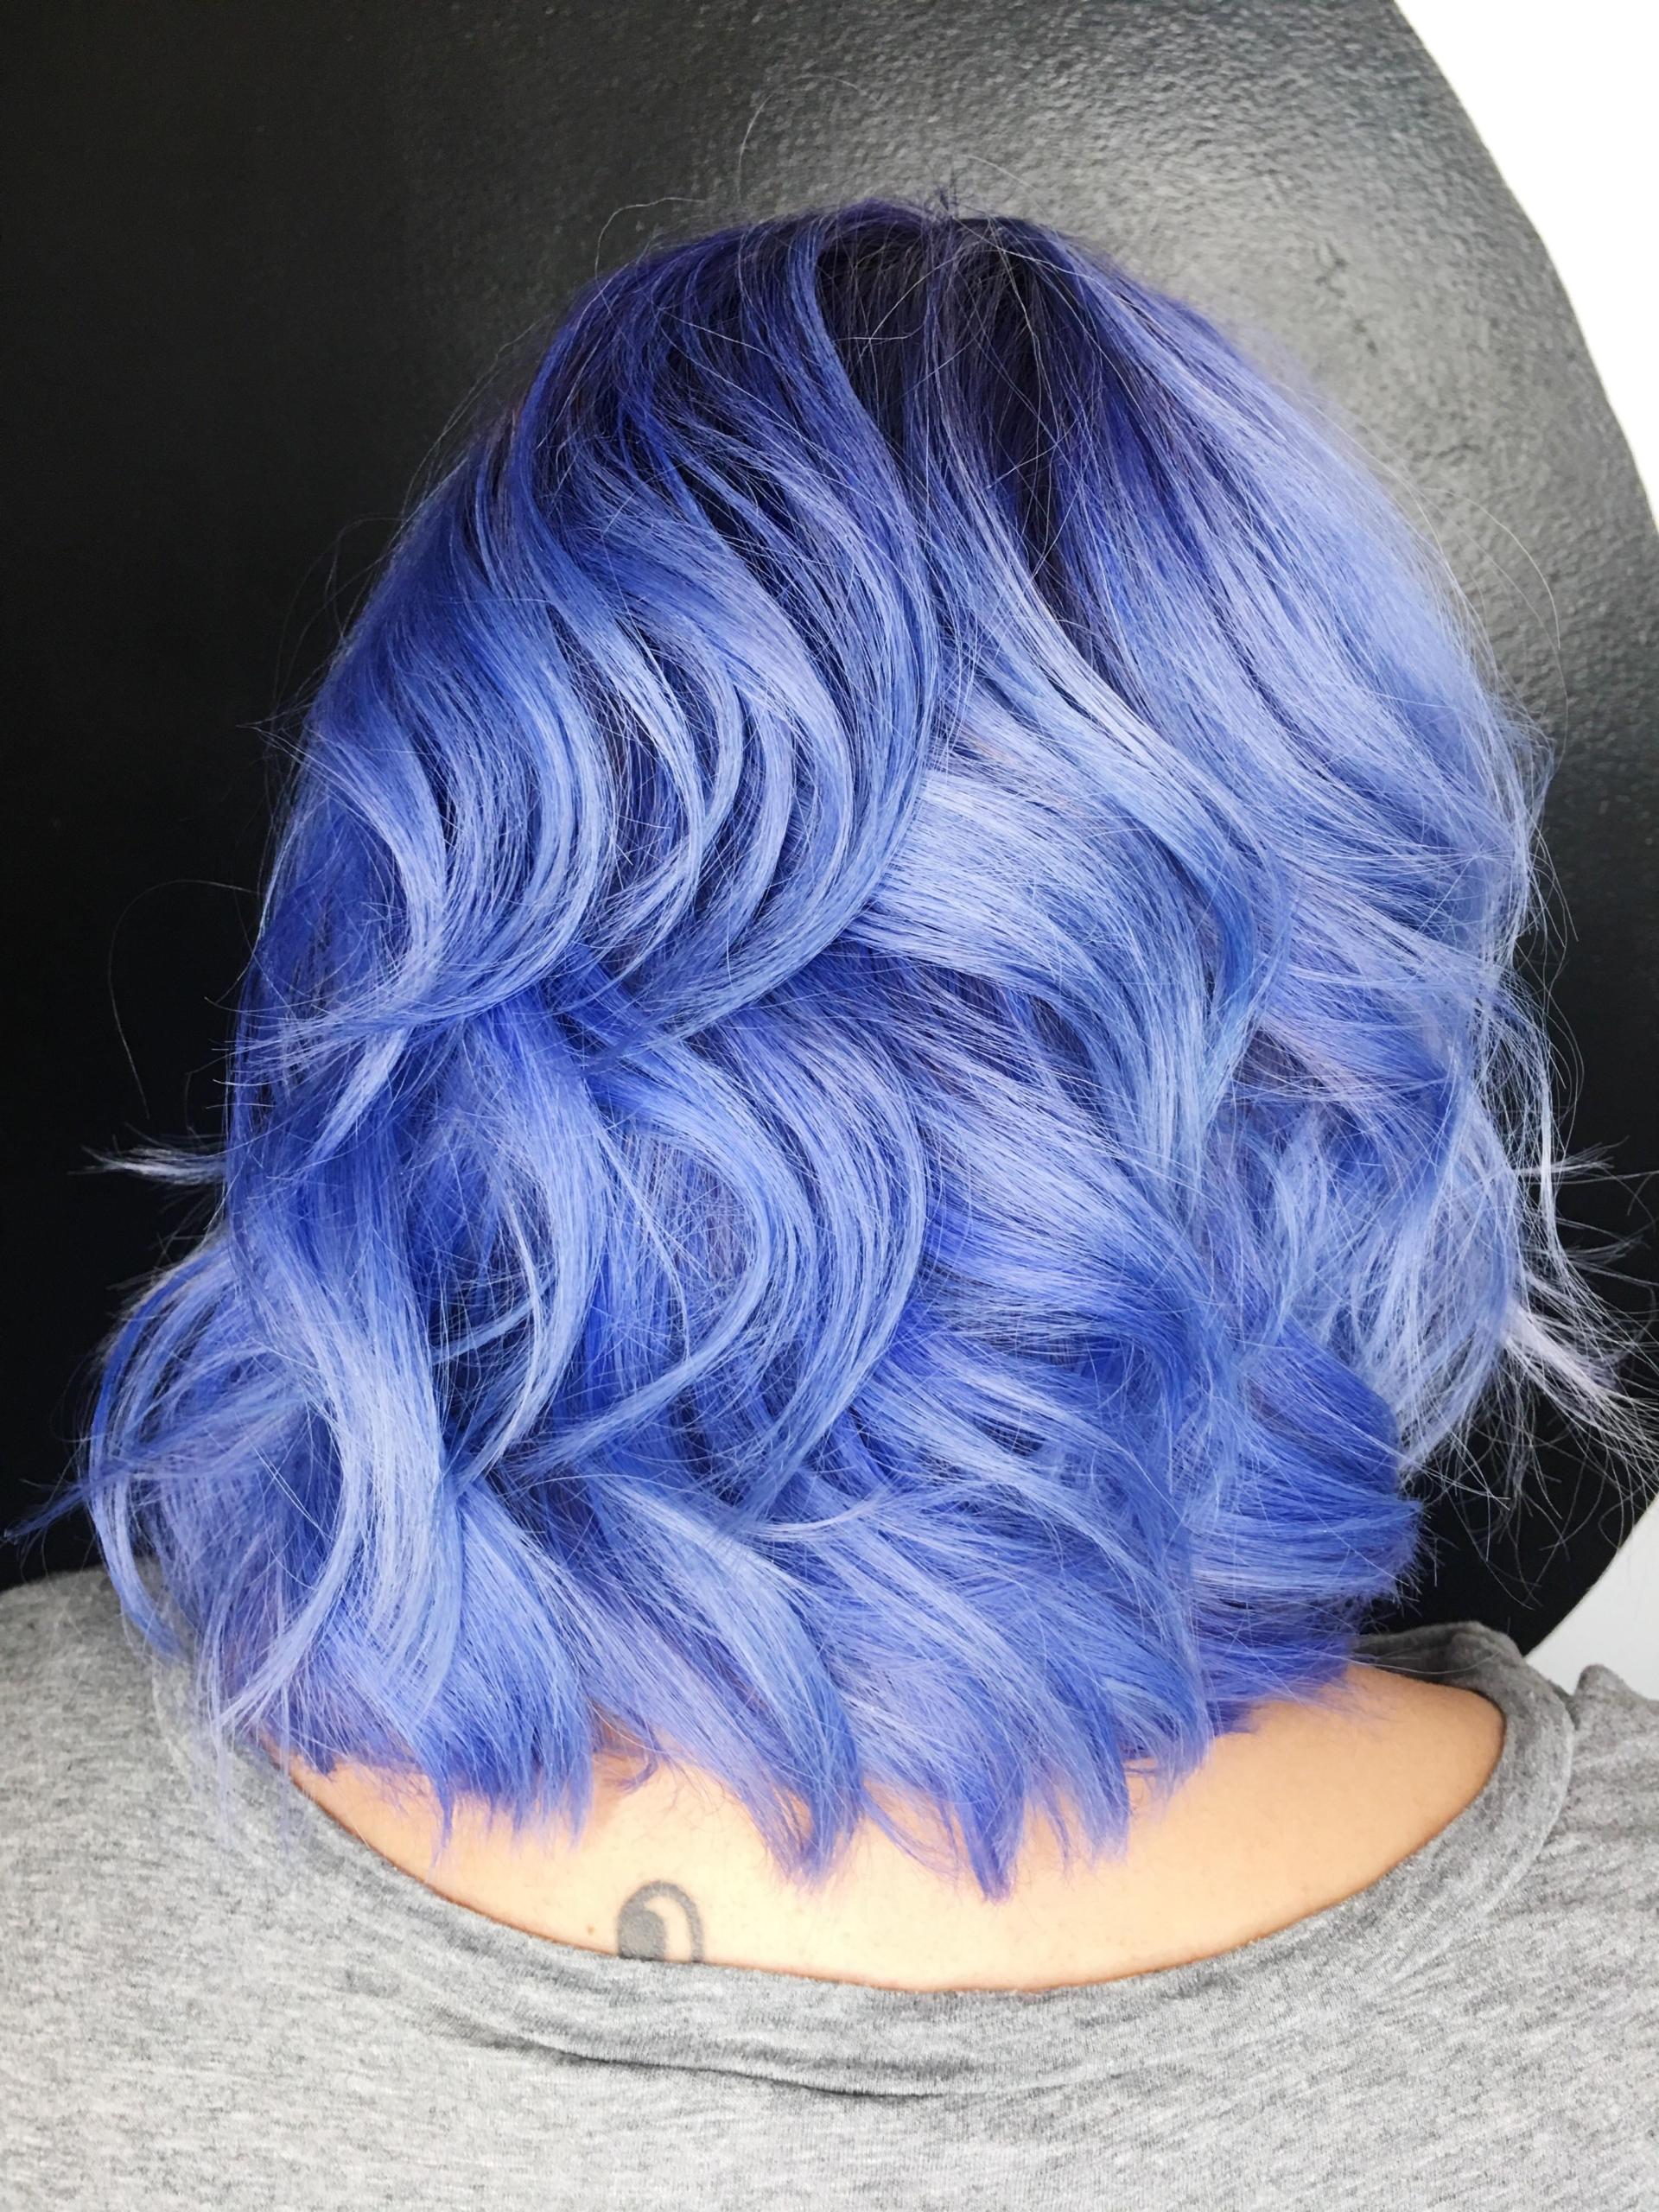 Latest Model – Periwinkle Hair